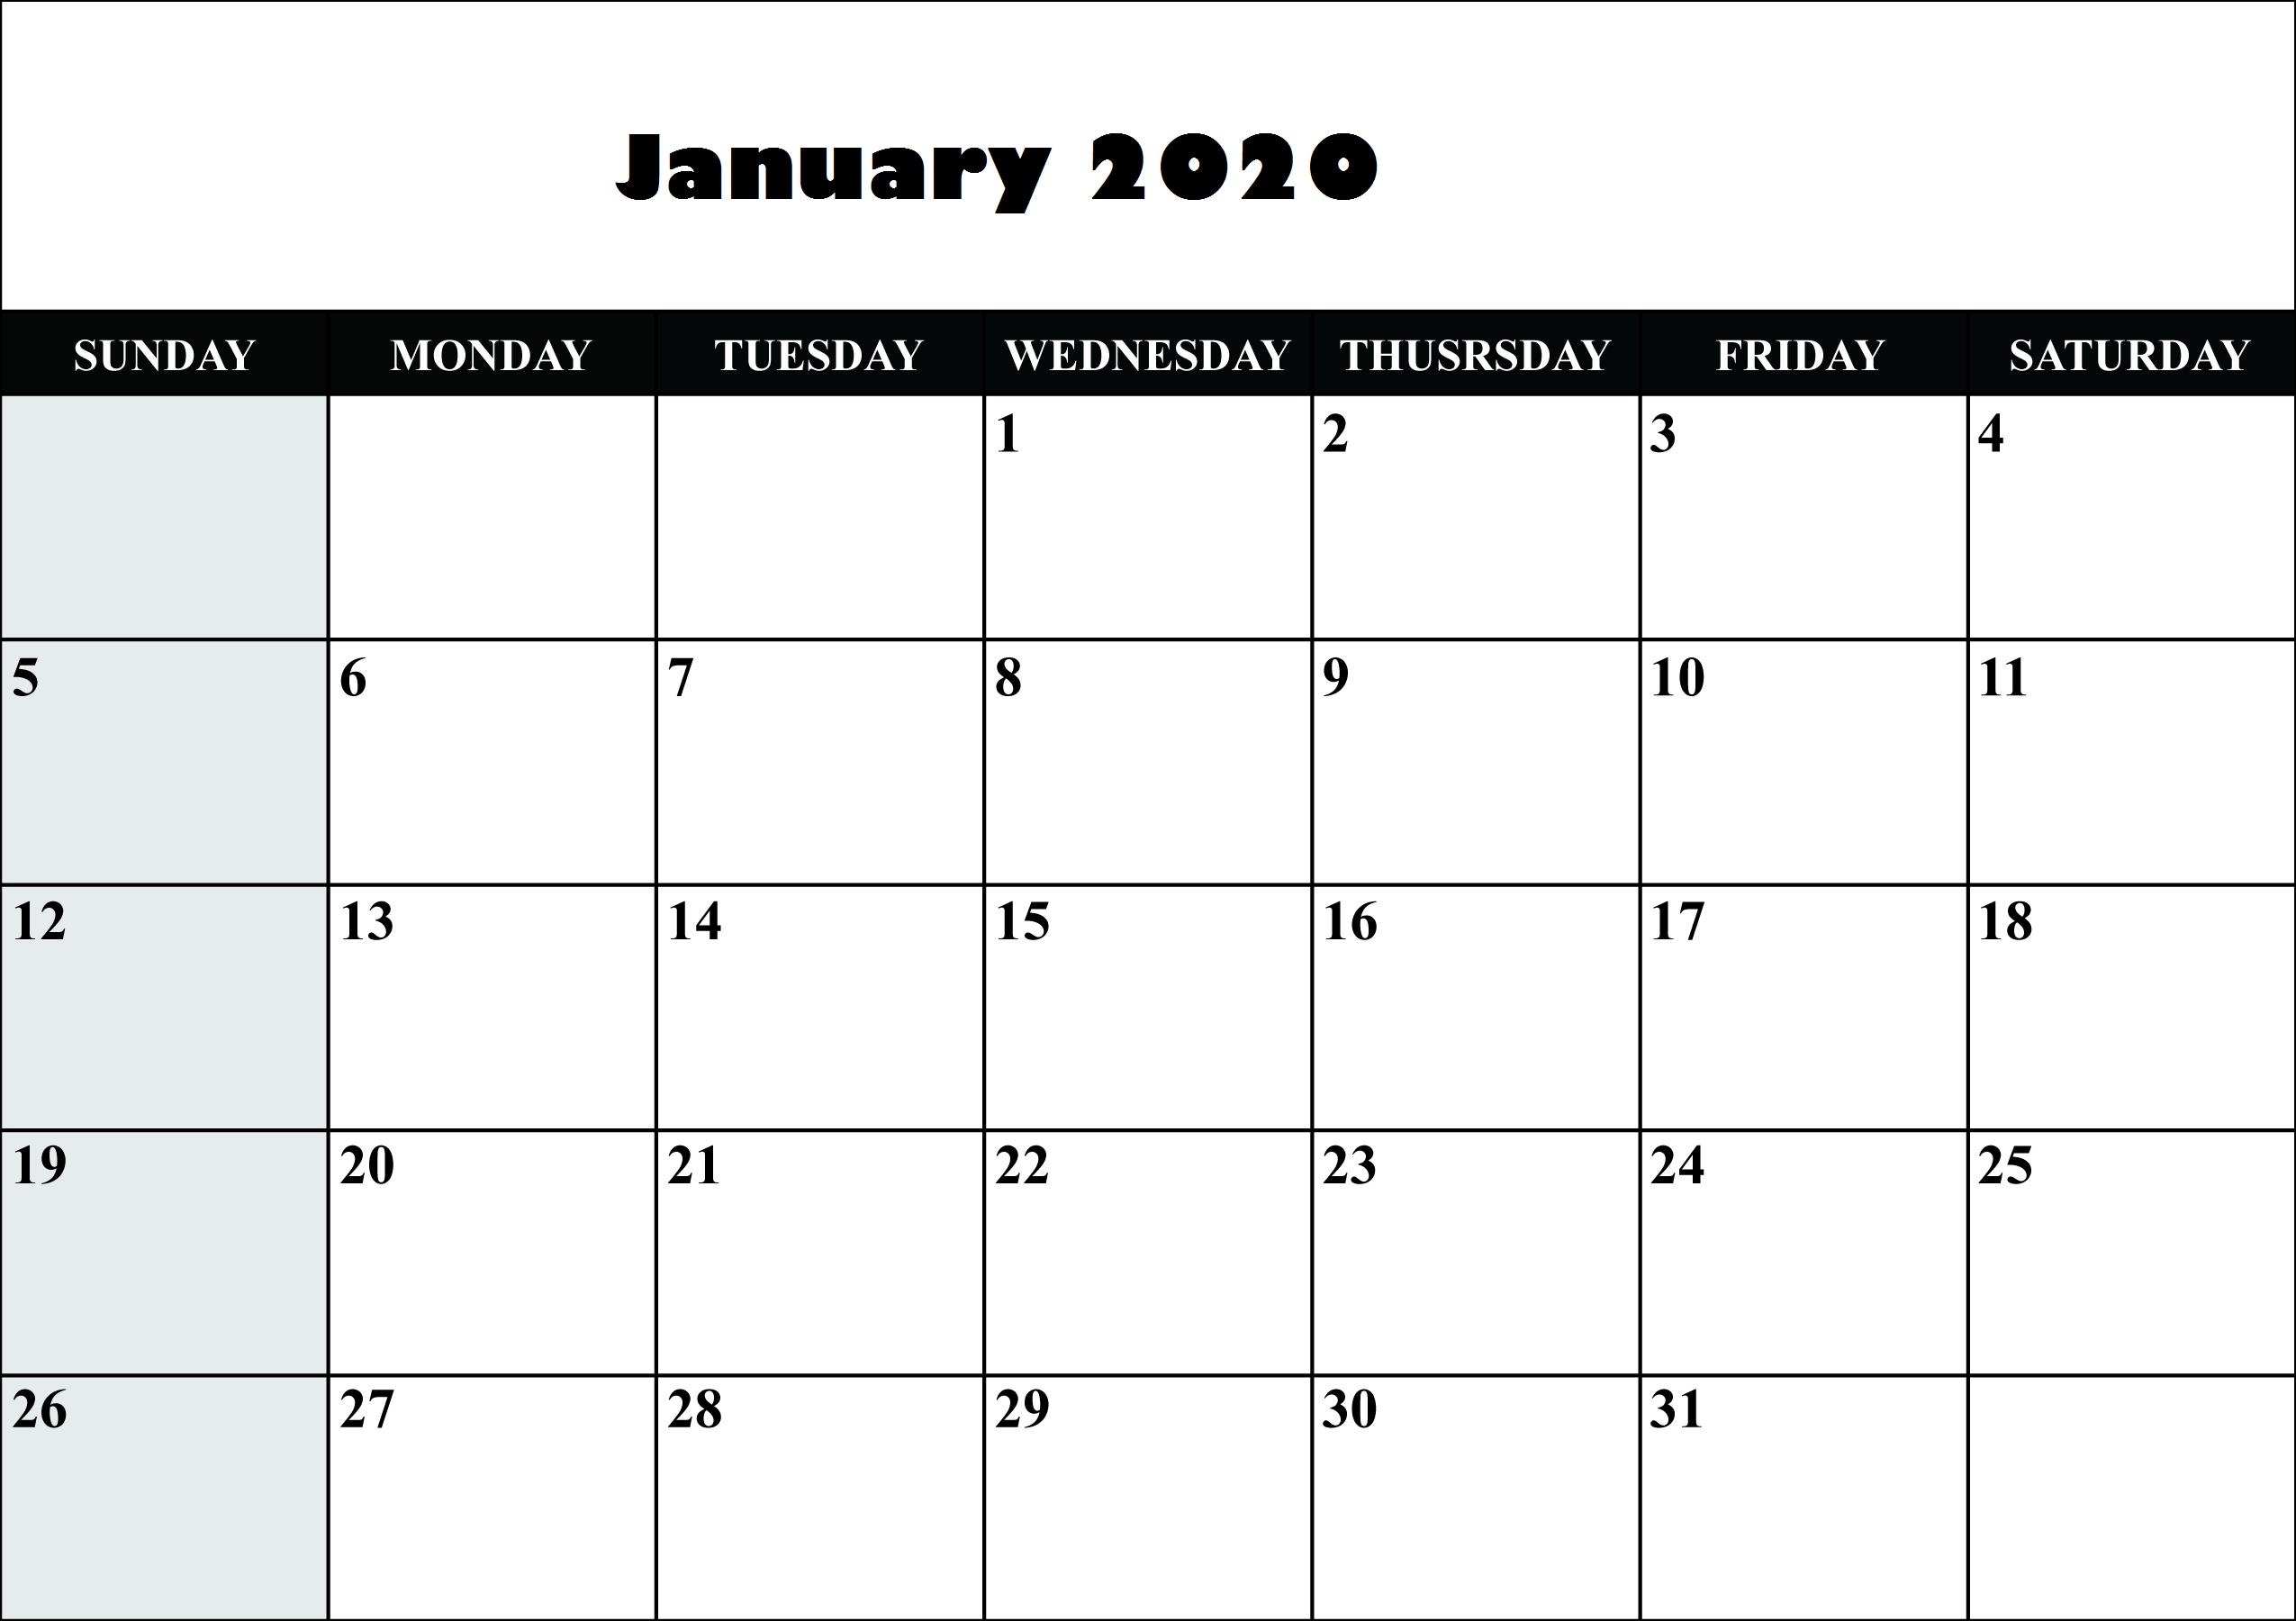 January 2020 Calendar Uk Federal Holidays List | Printable